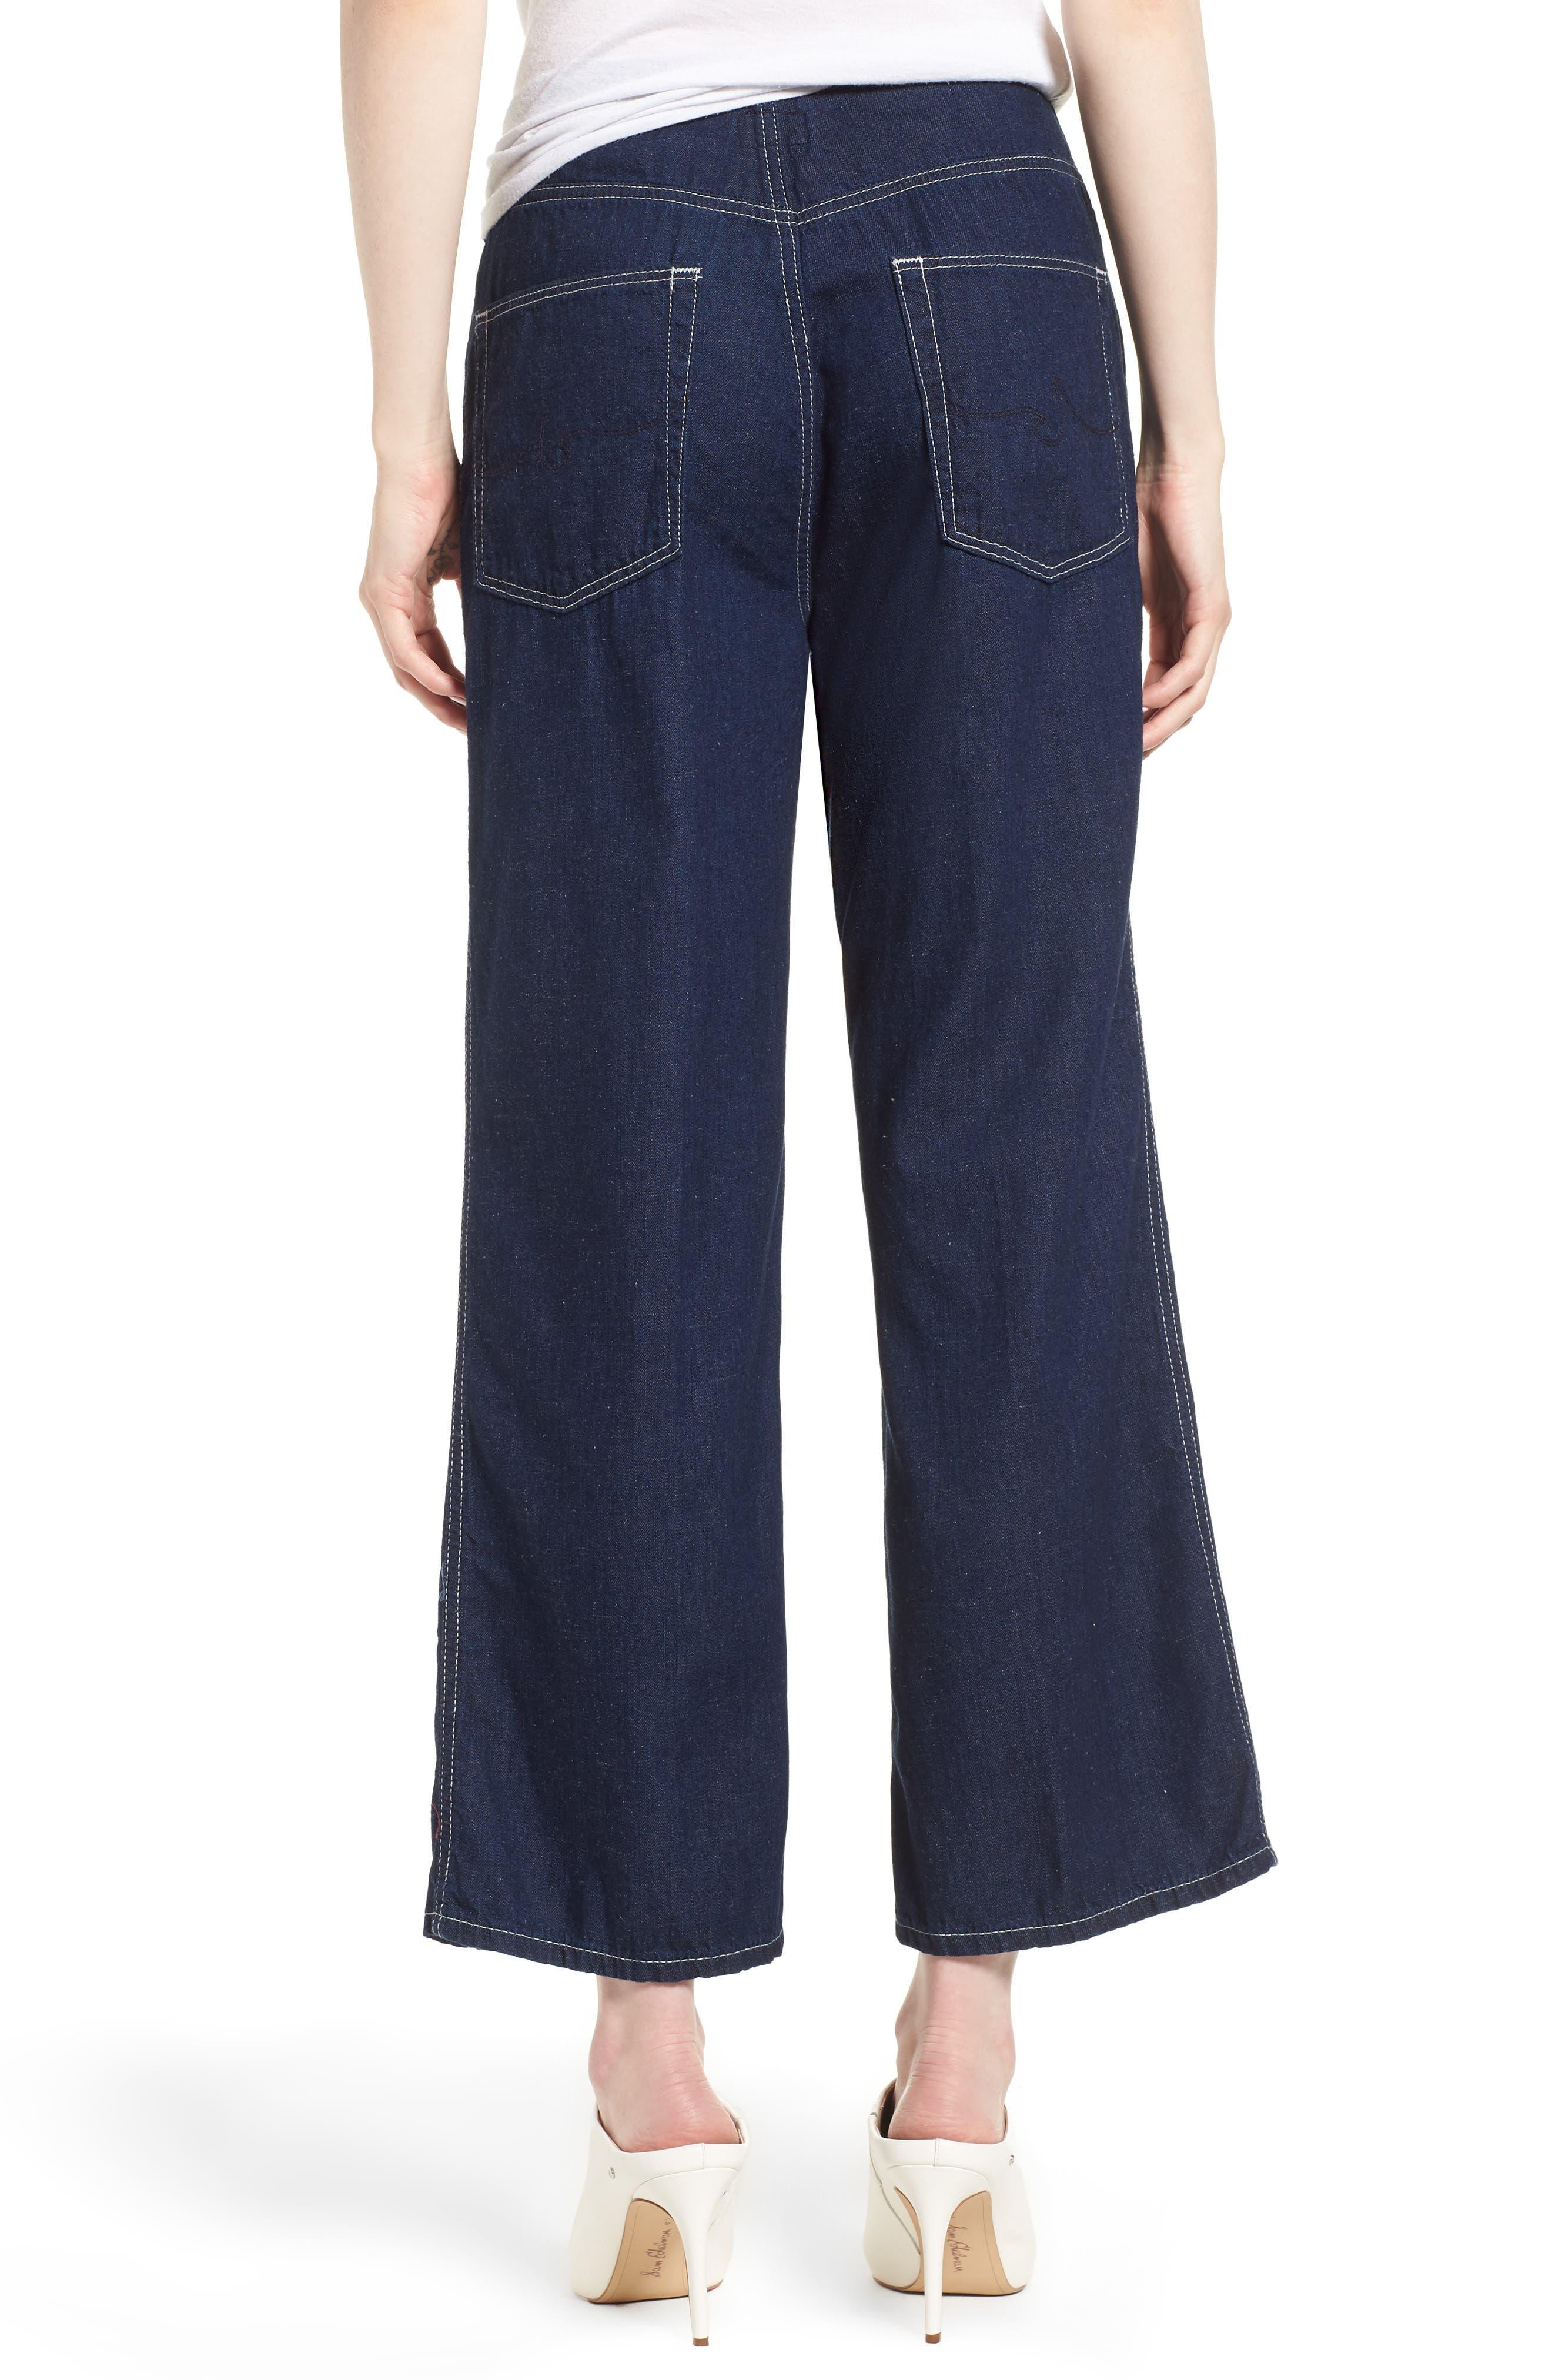 Etta High Waist Crop Wide Leg Jeans,                             Alternate thumbnail 2, color,                             496